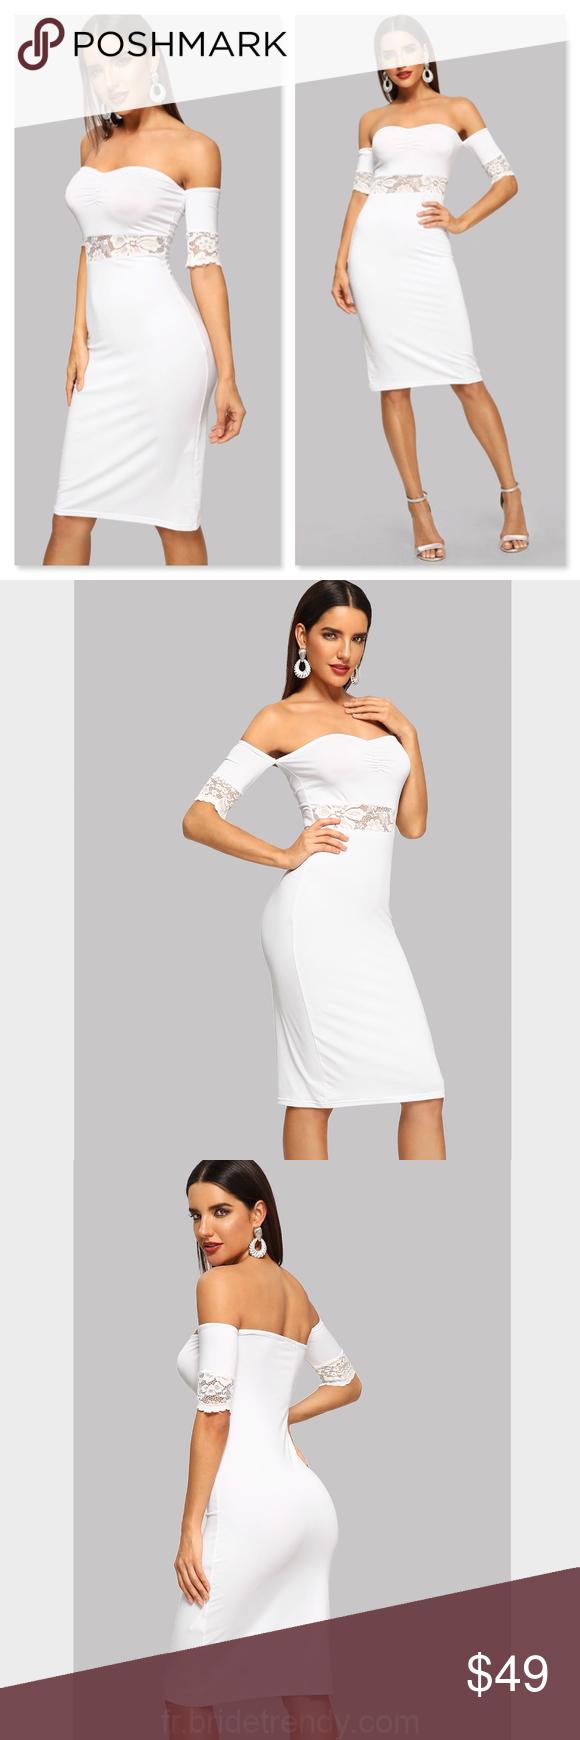 Dentelle Épaule Off Bodycon Robe Blanche Blanc Élégant, Glamour, Sexy 95% Polyester, 5% Spande... #summerdinneroutfits